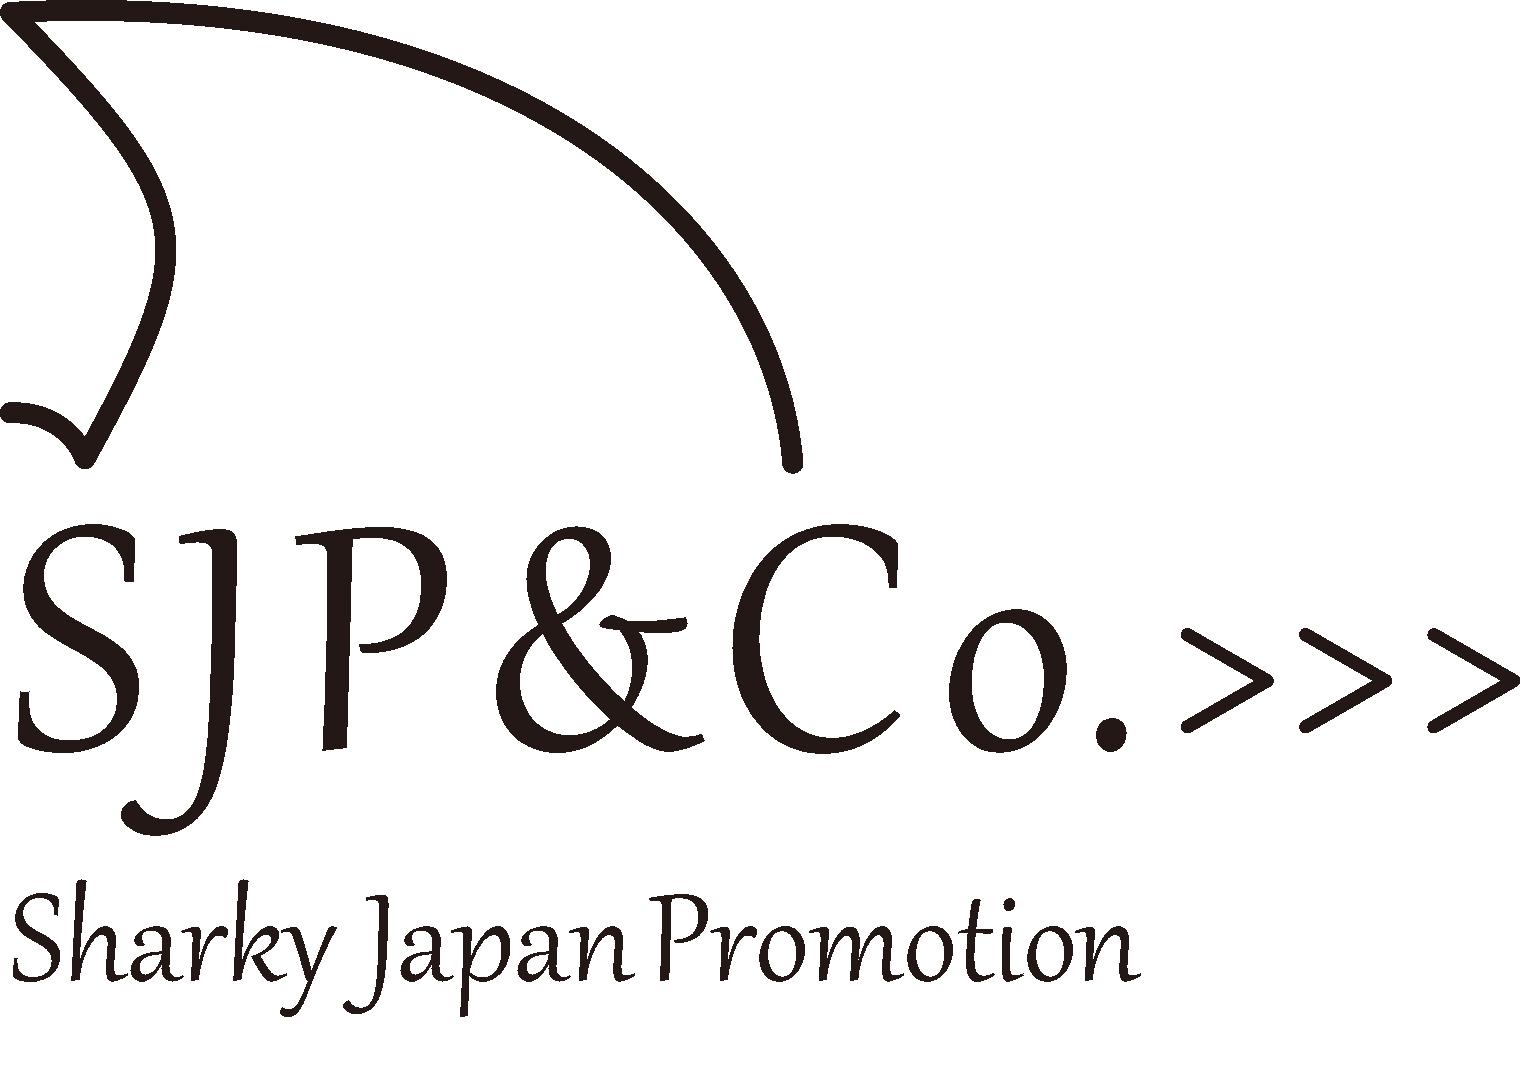 sjp logo_003_161208_背景透過